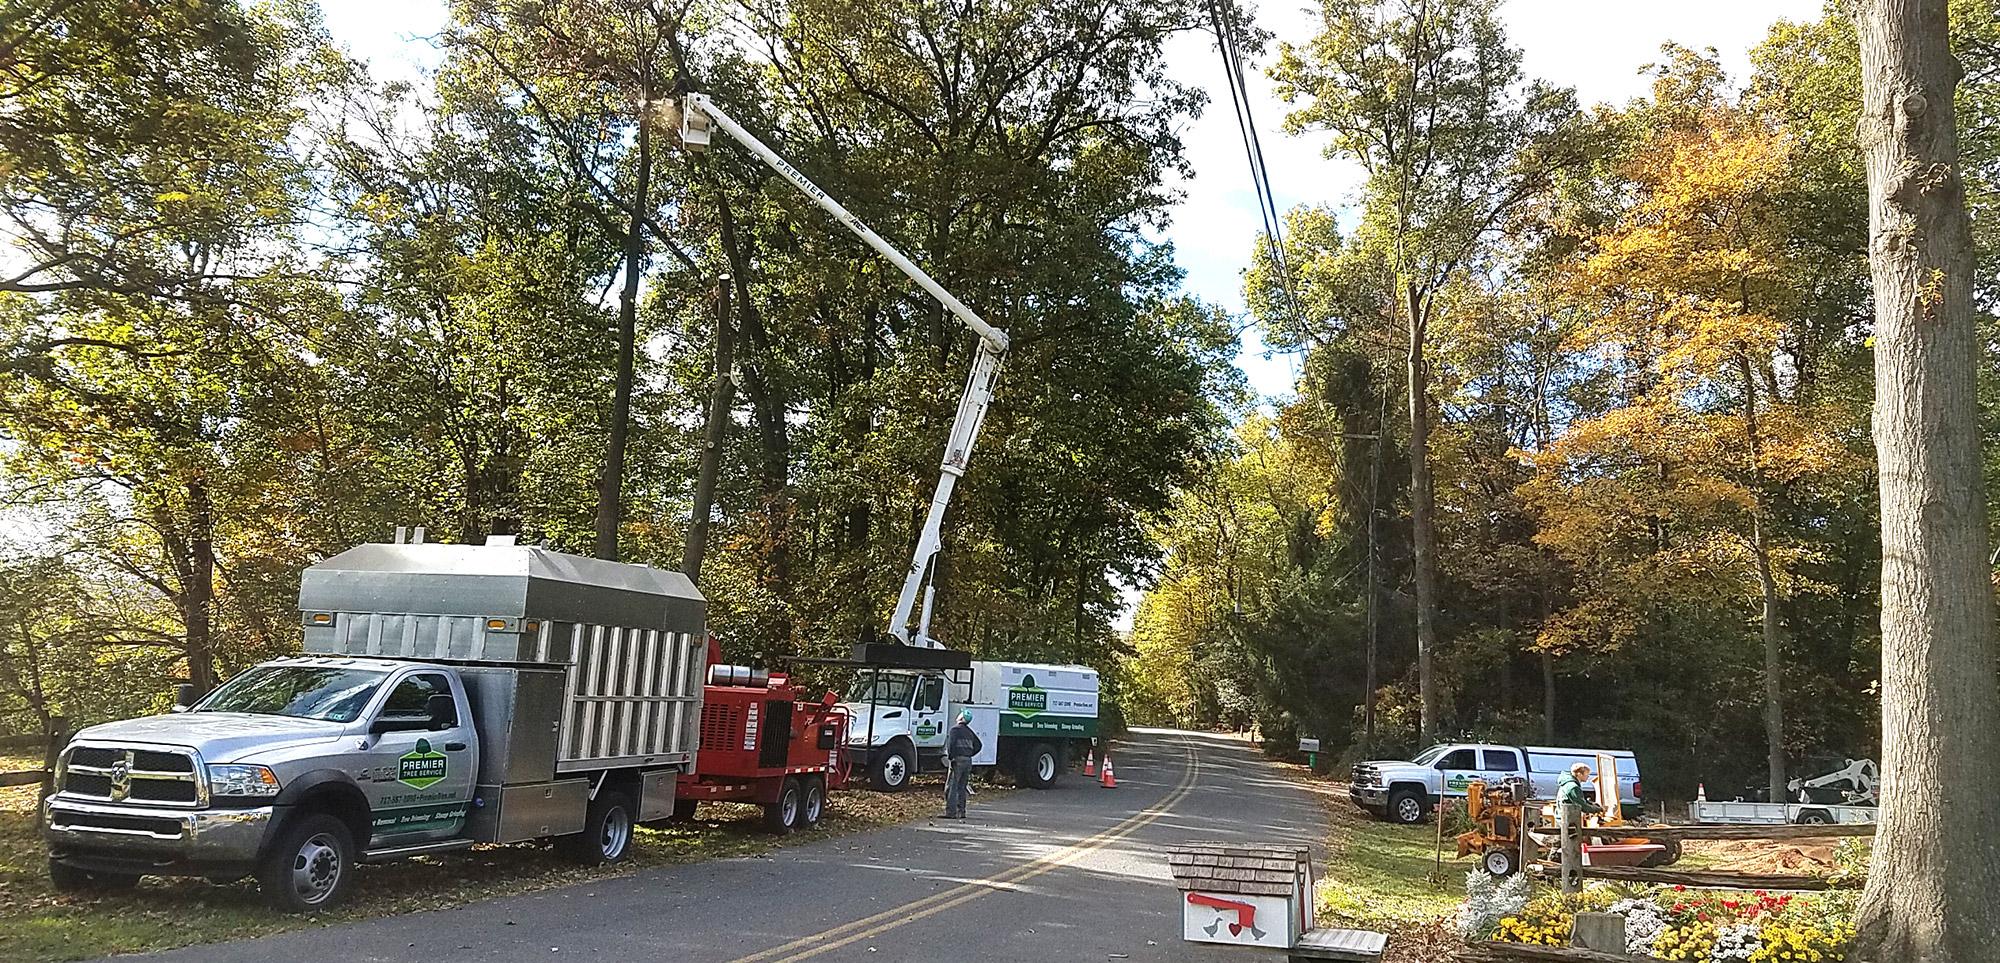 Tree trimming at work